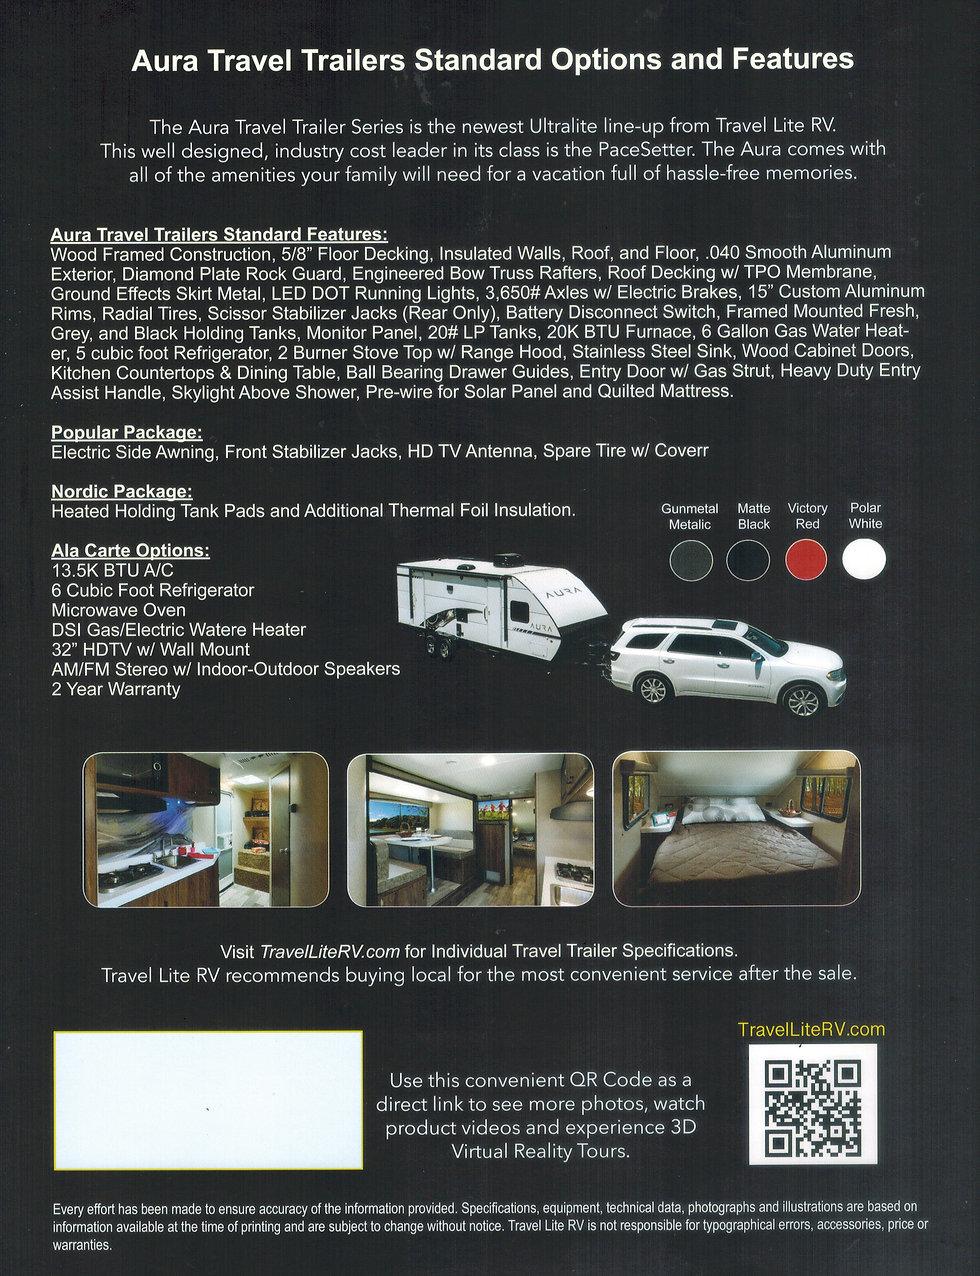 Travel Lite Aura Brochure Page 4.jpg